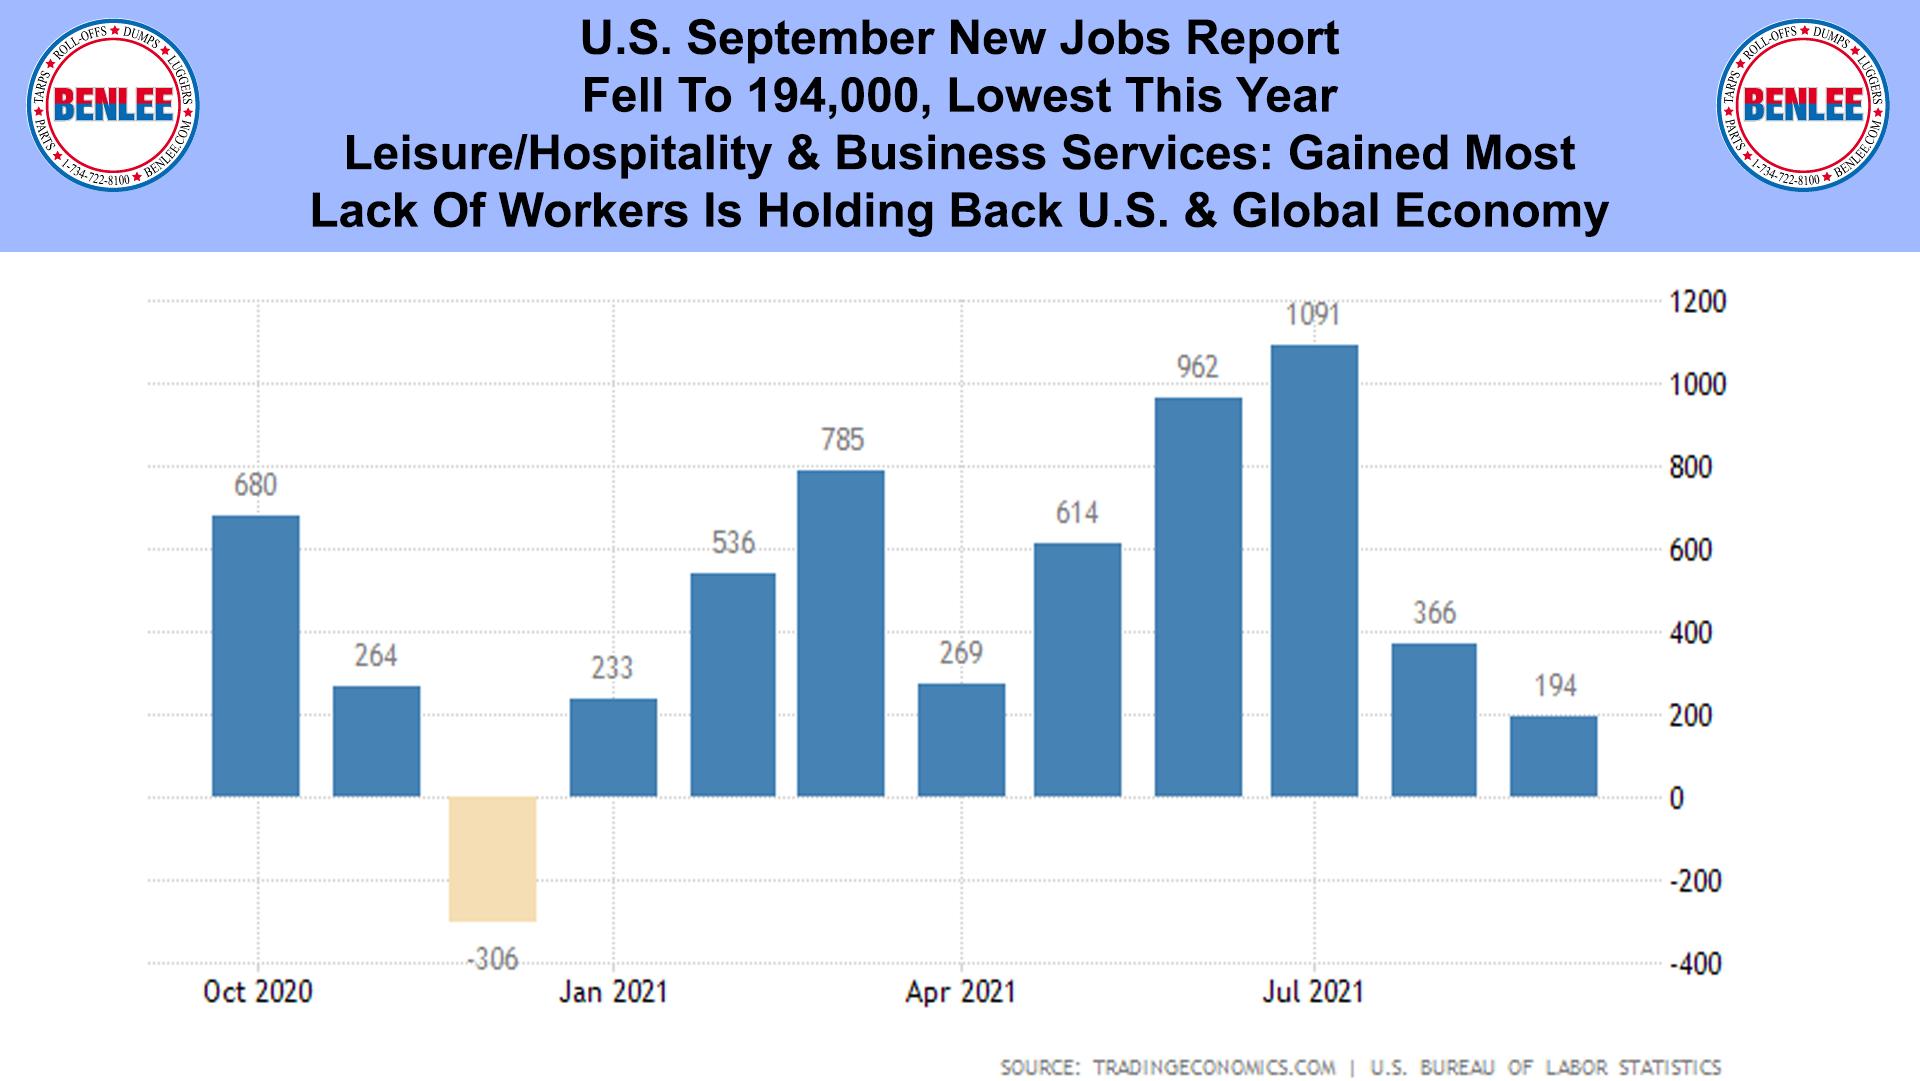 U.S. September New Jobs Report